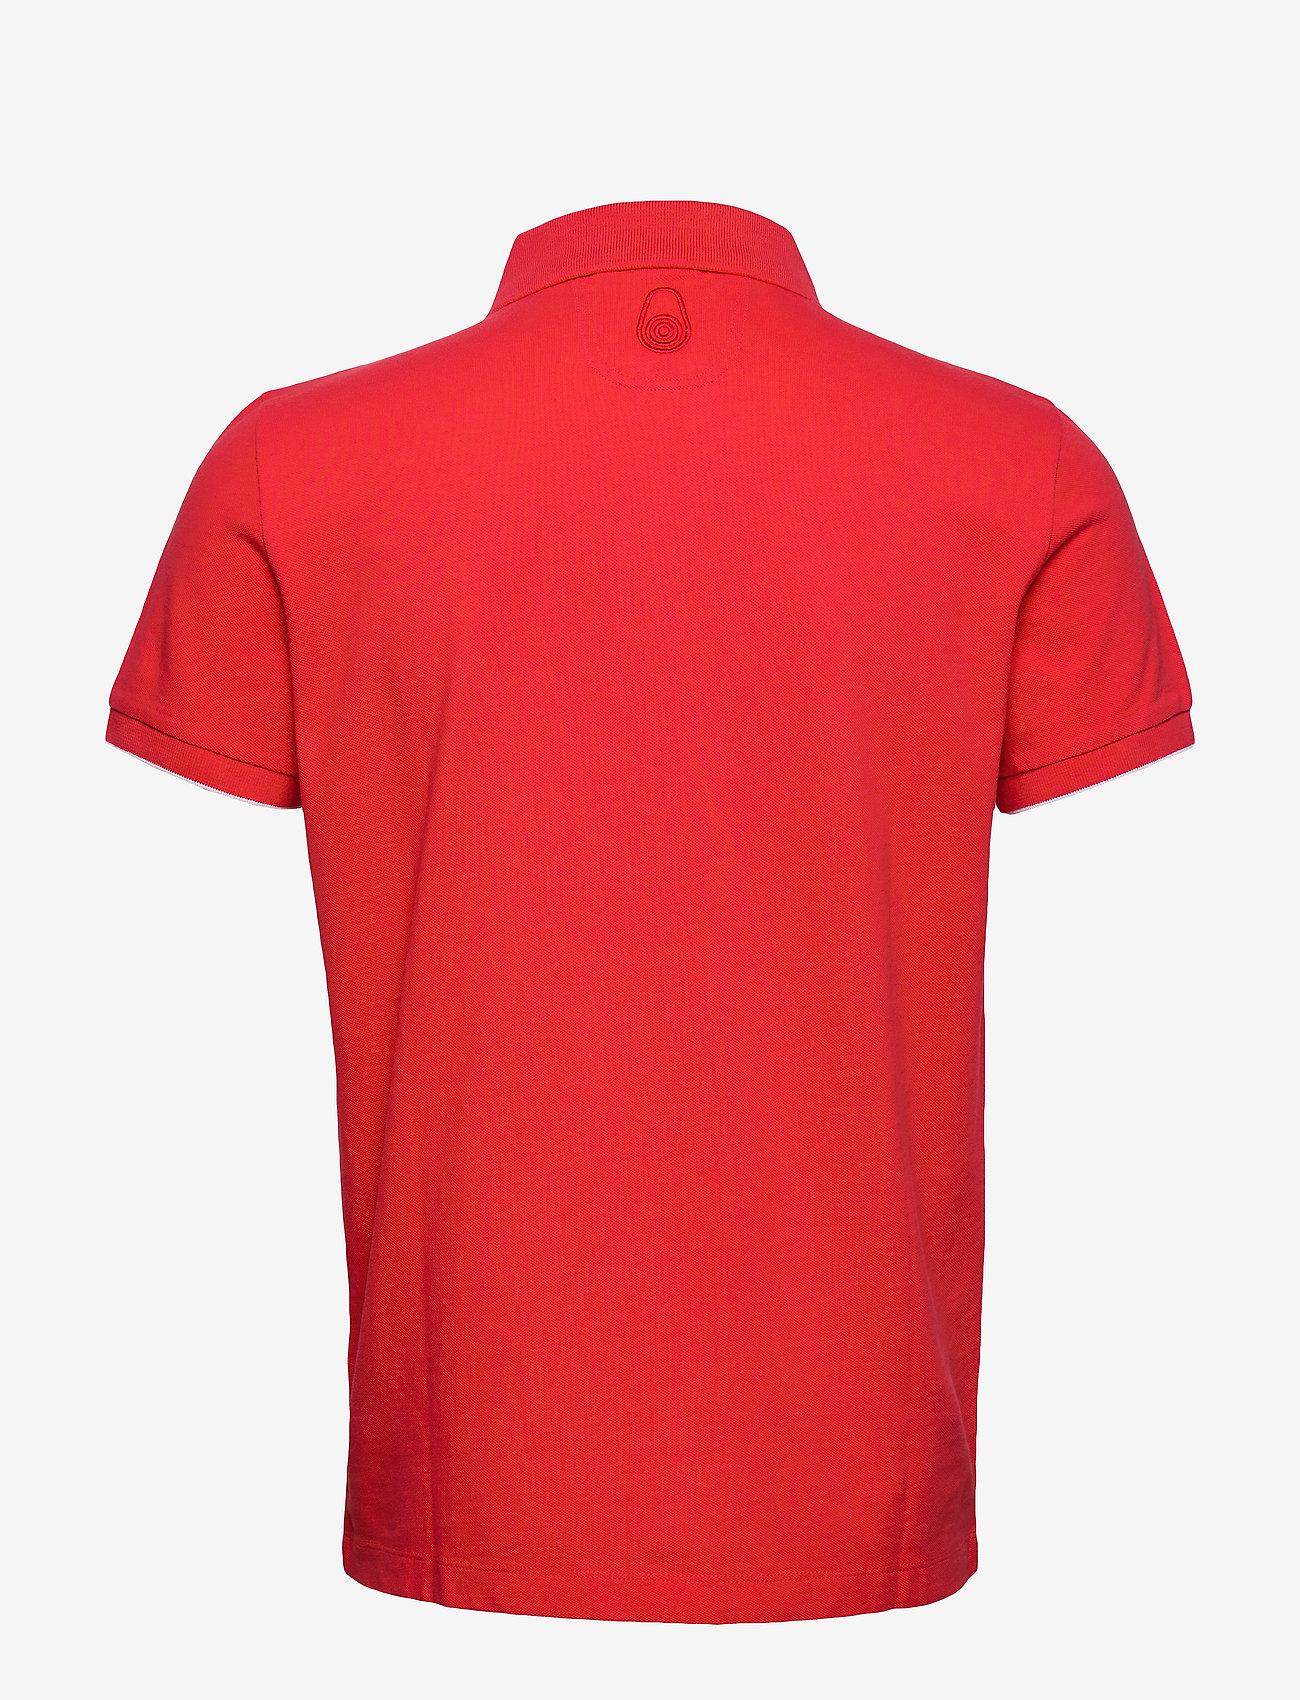 Sail Racing - BOWMAN POLO - paidat - bright red - 1